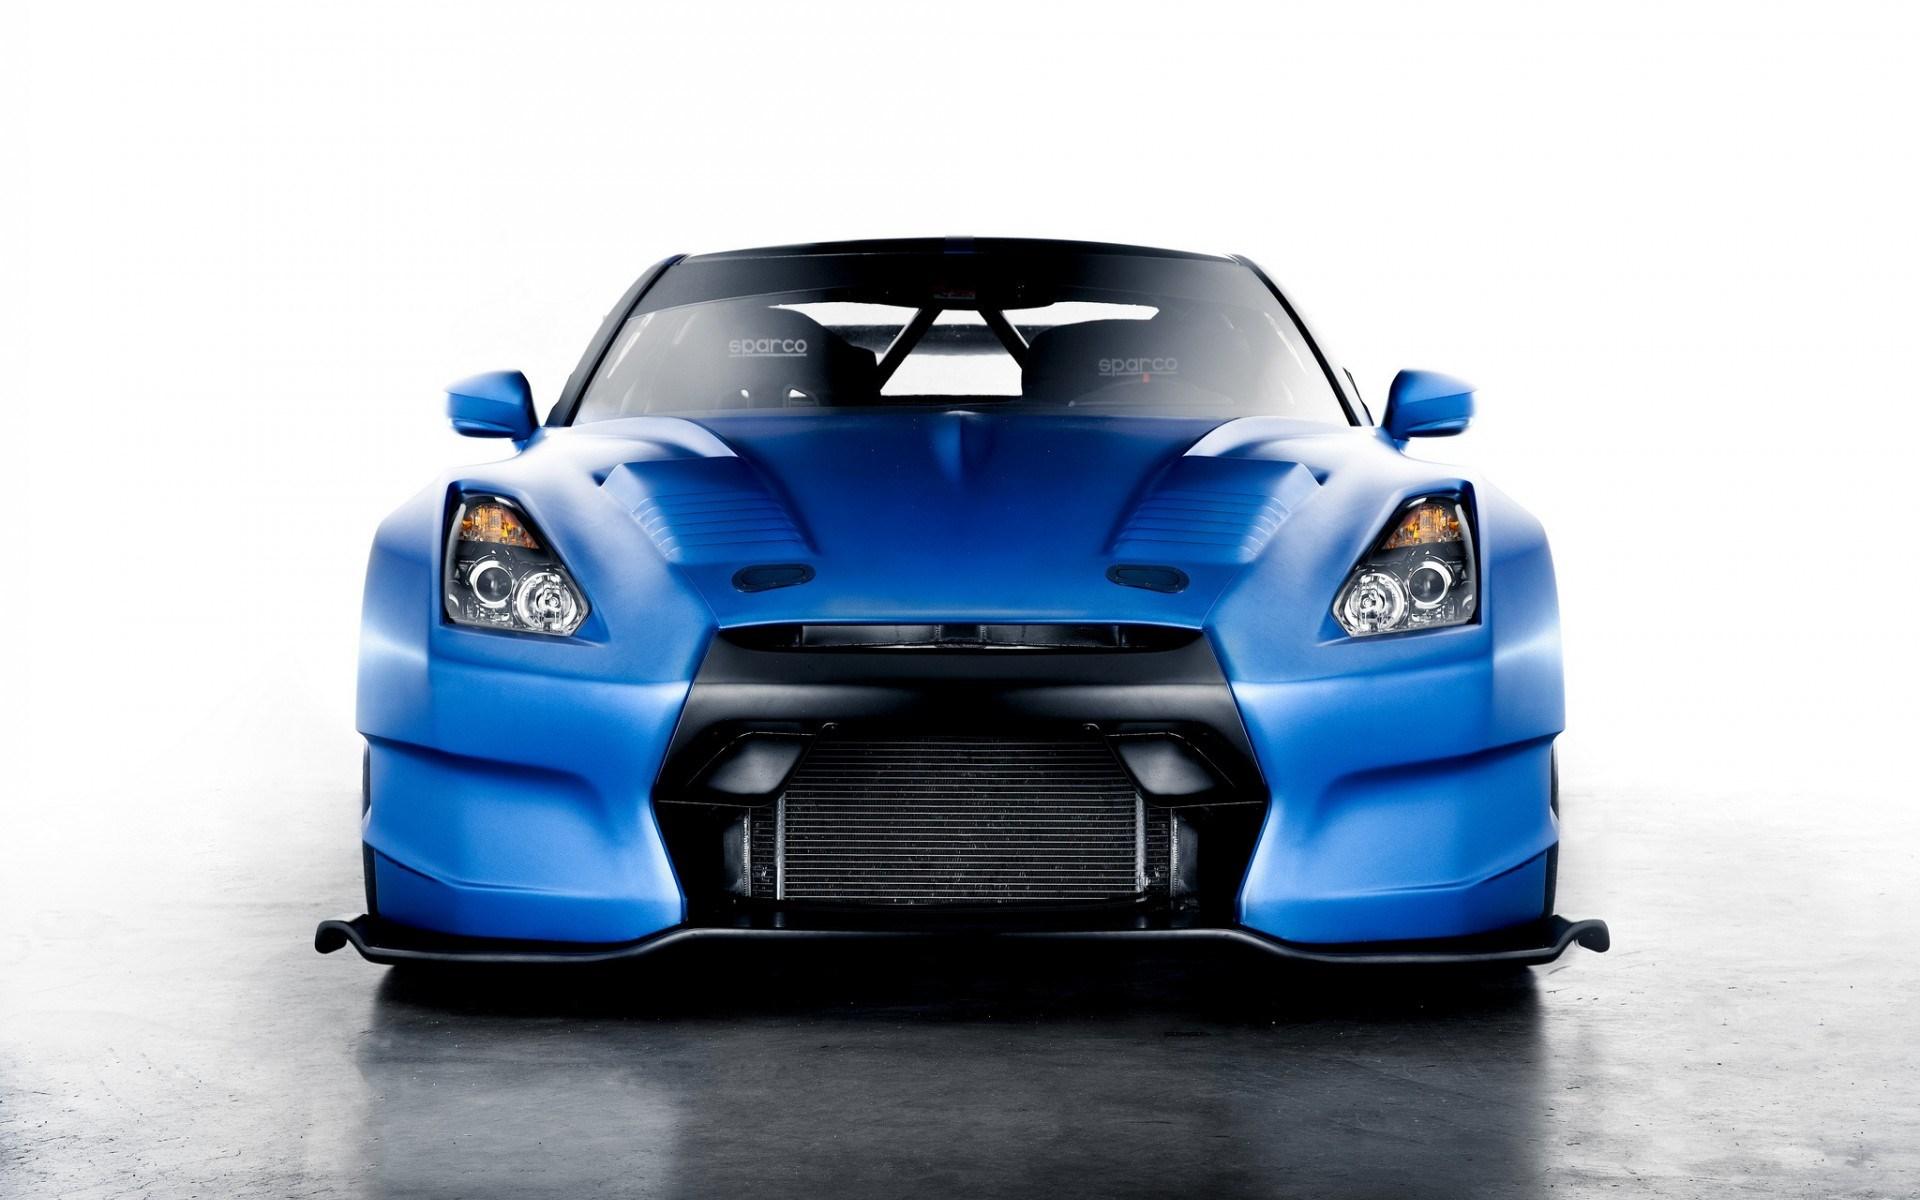 Amazing Blue Car Wallpaper